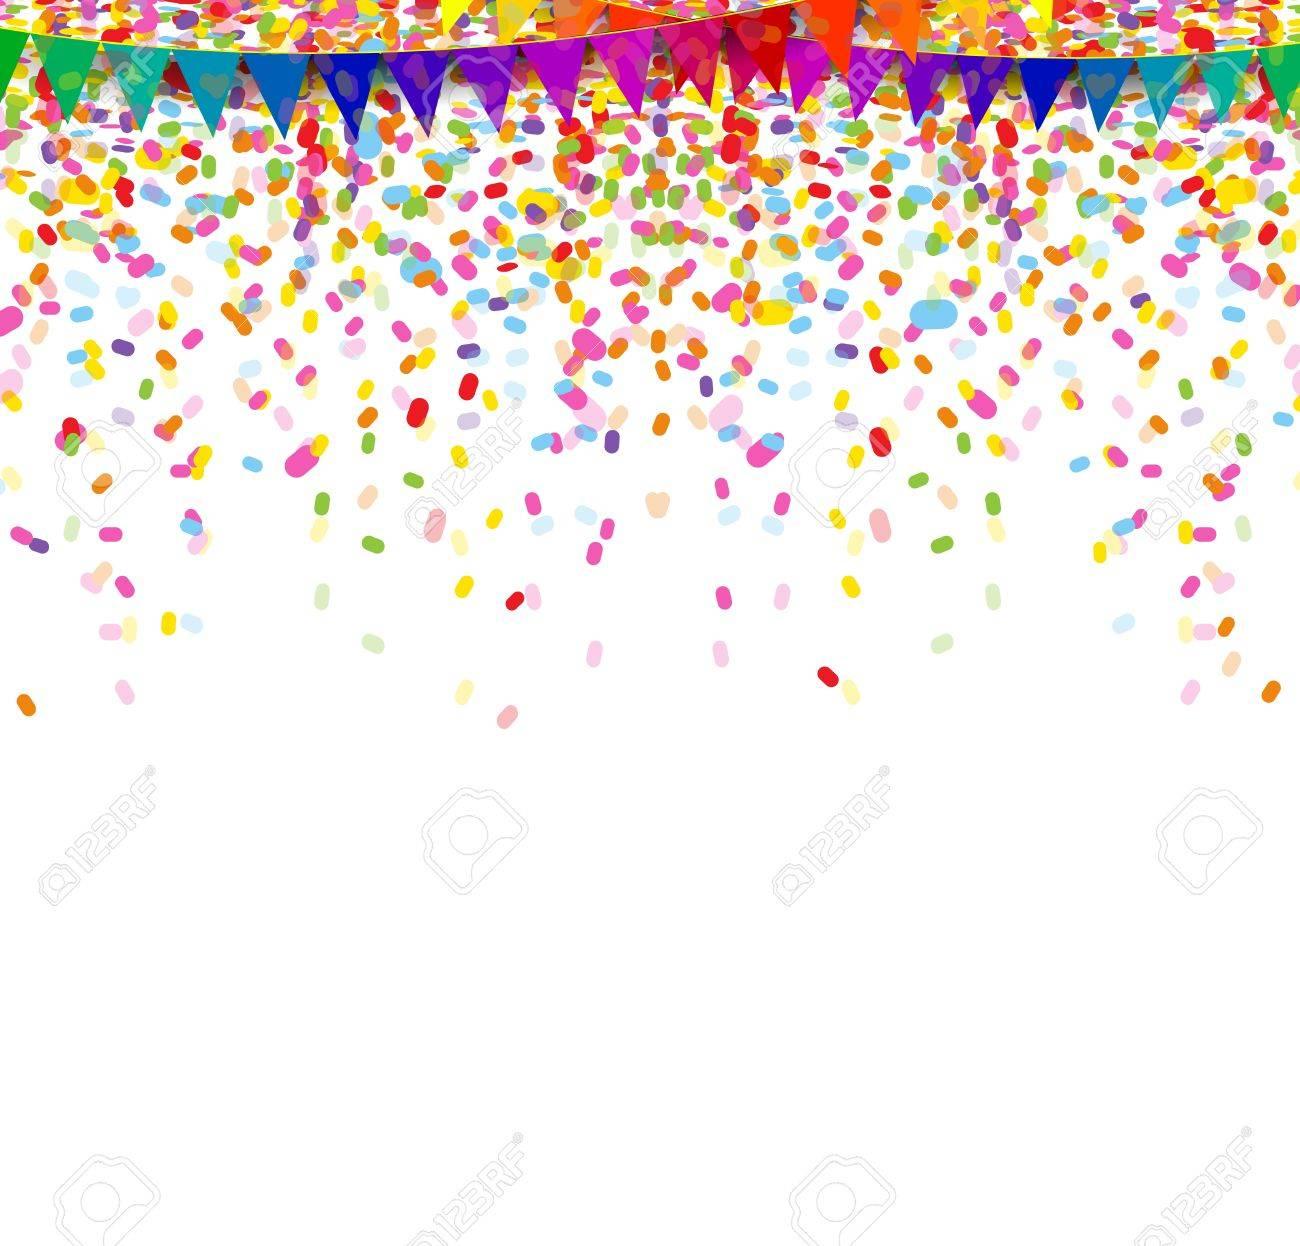 colorful confetti on white background - 38408525